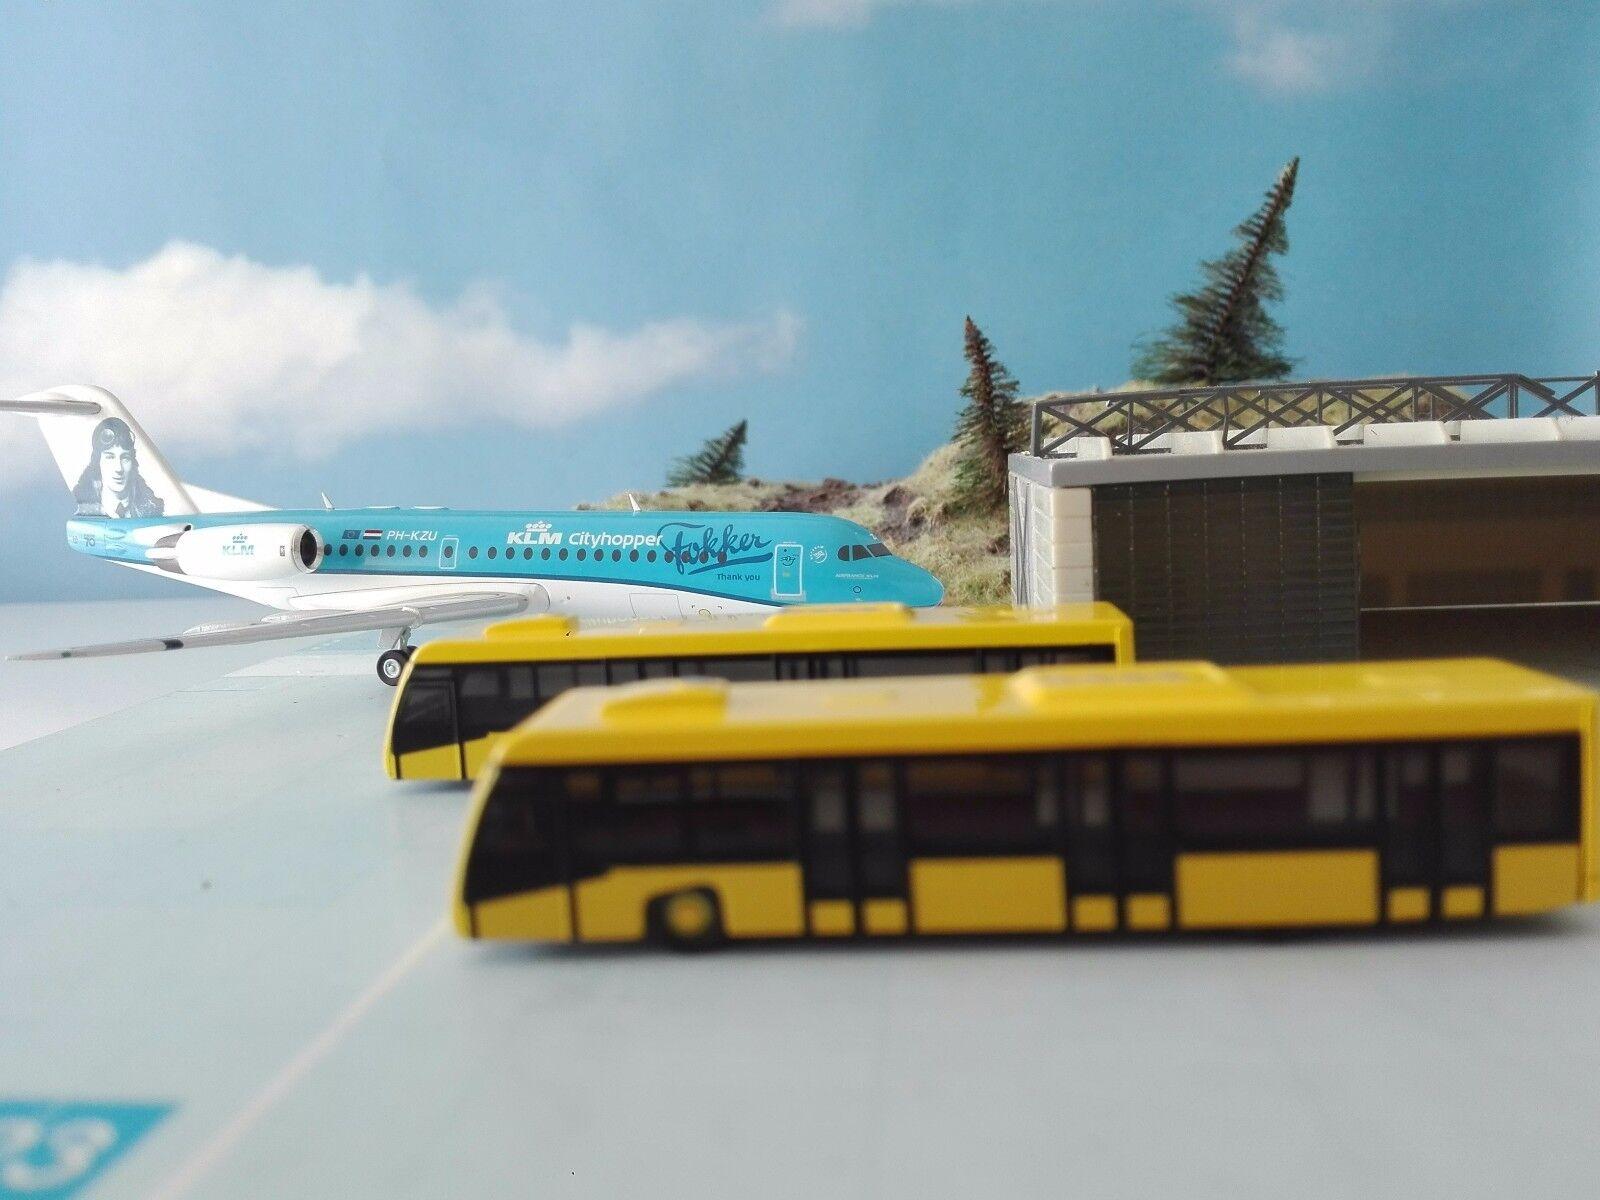 Herpa Herpa Herpa Wings 1 200 artículo nuevo 558631 scenix-Airport autobús set - 2er set * ce31e3